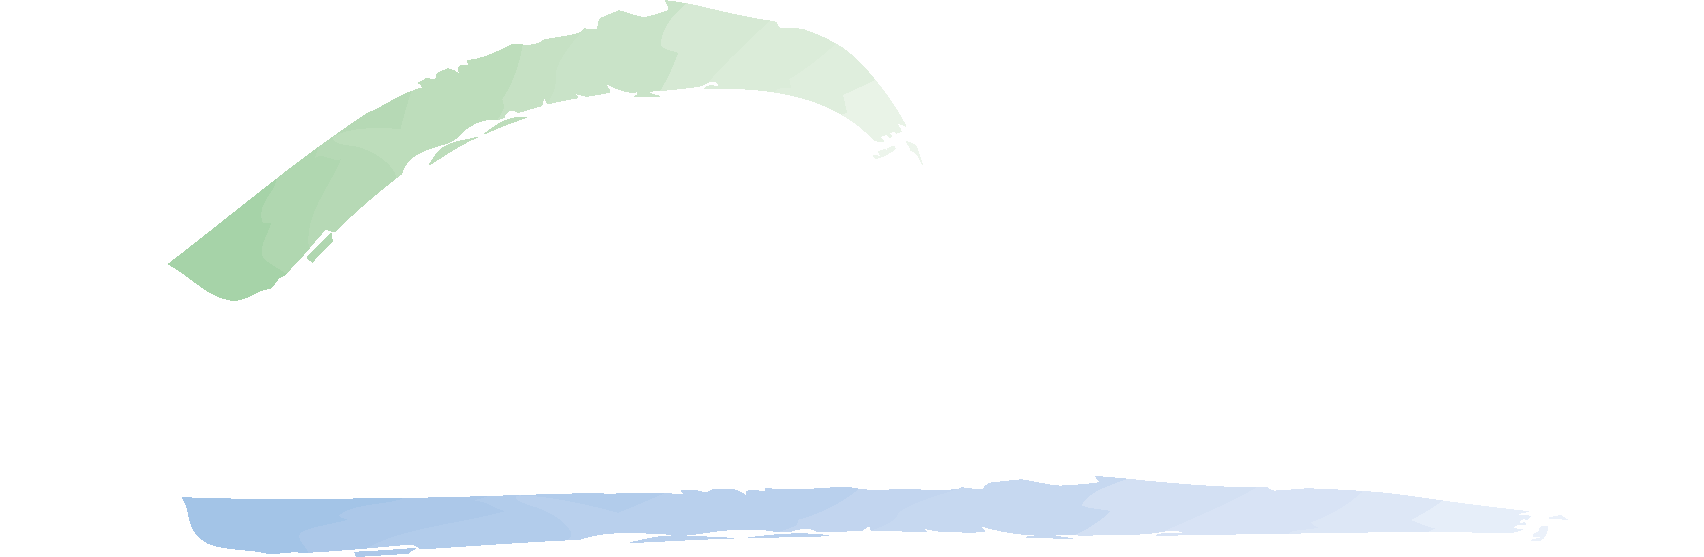 Ville de Sarrebourg